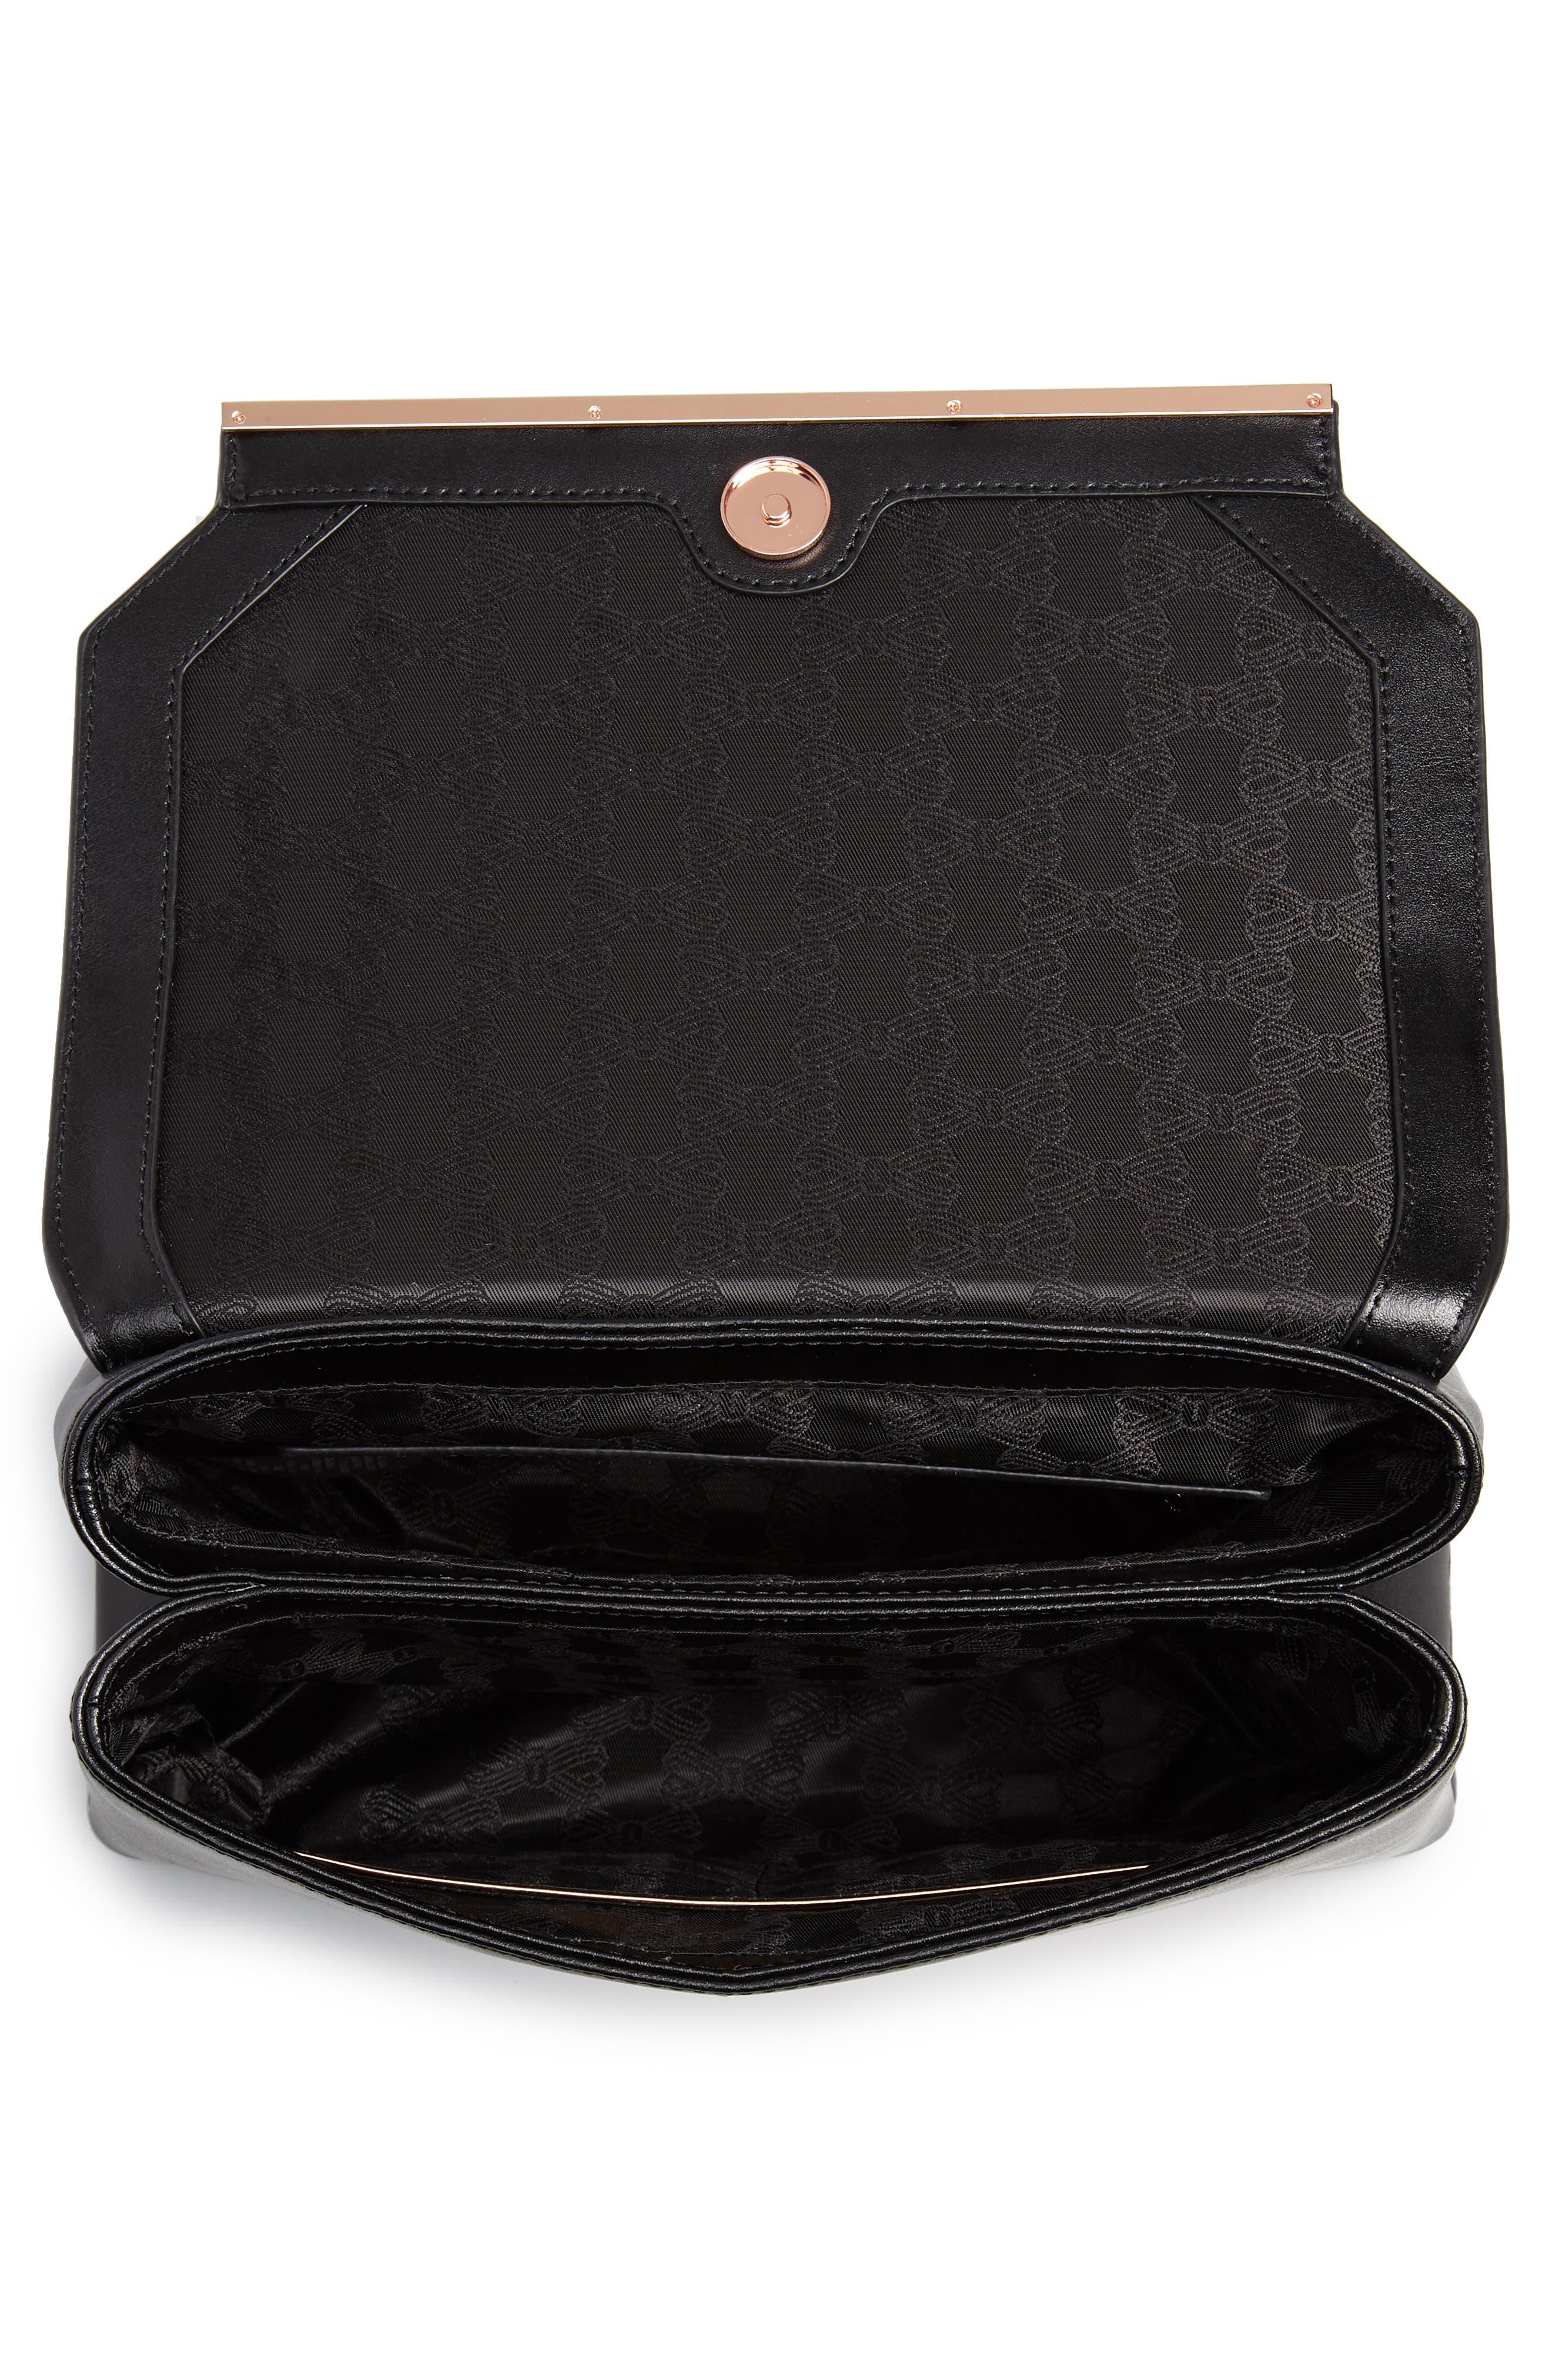 Crystal Bar Leather Top Handle Satchel,                             Alternate thumbnail 4, color,                             001